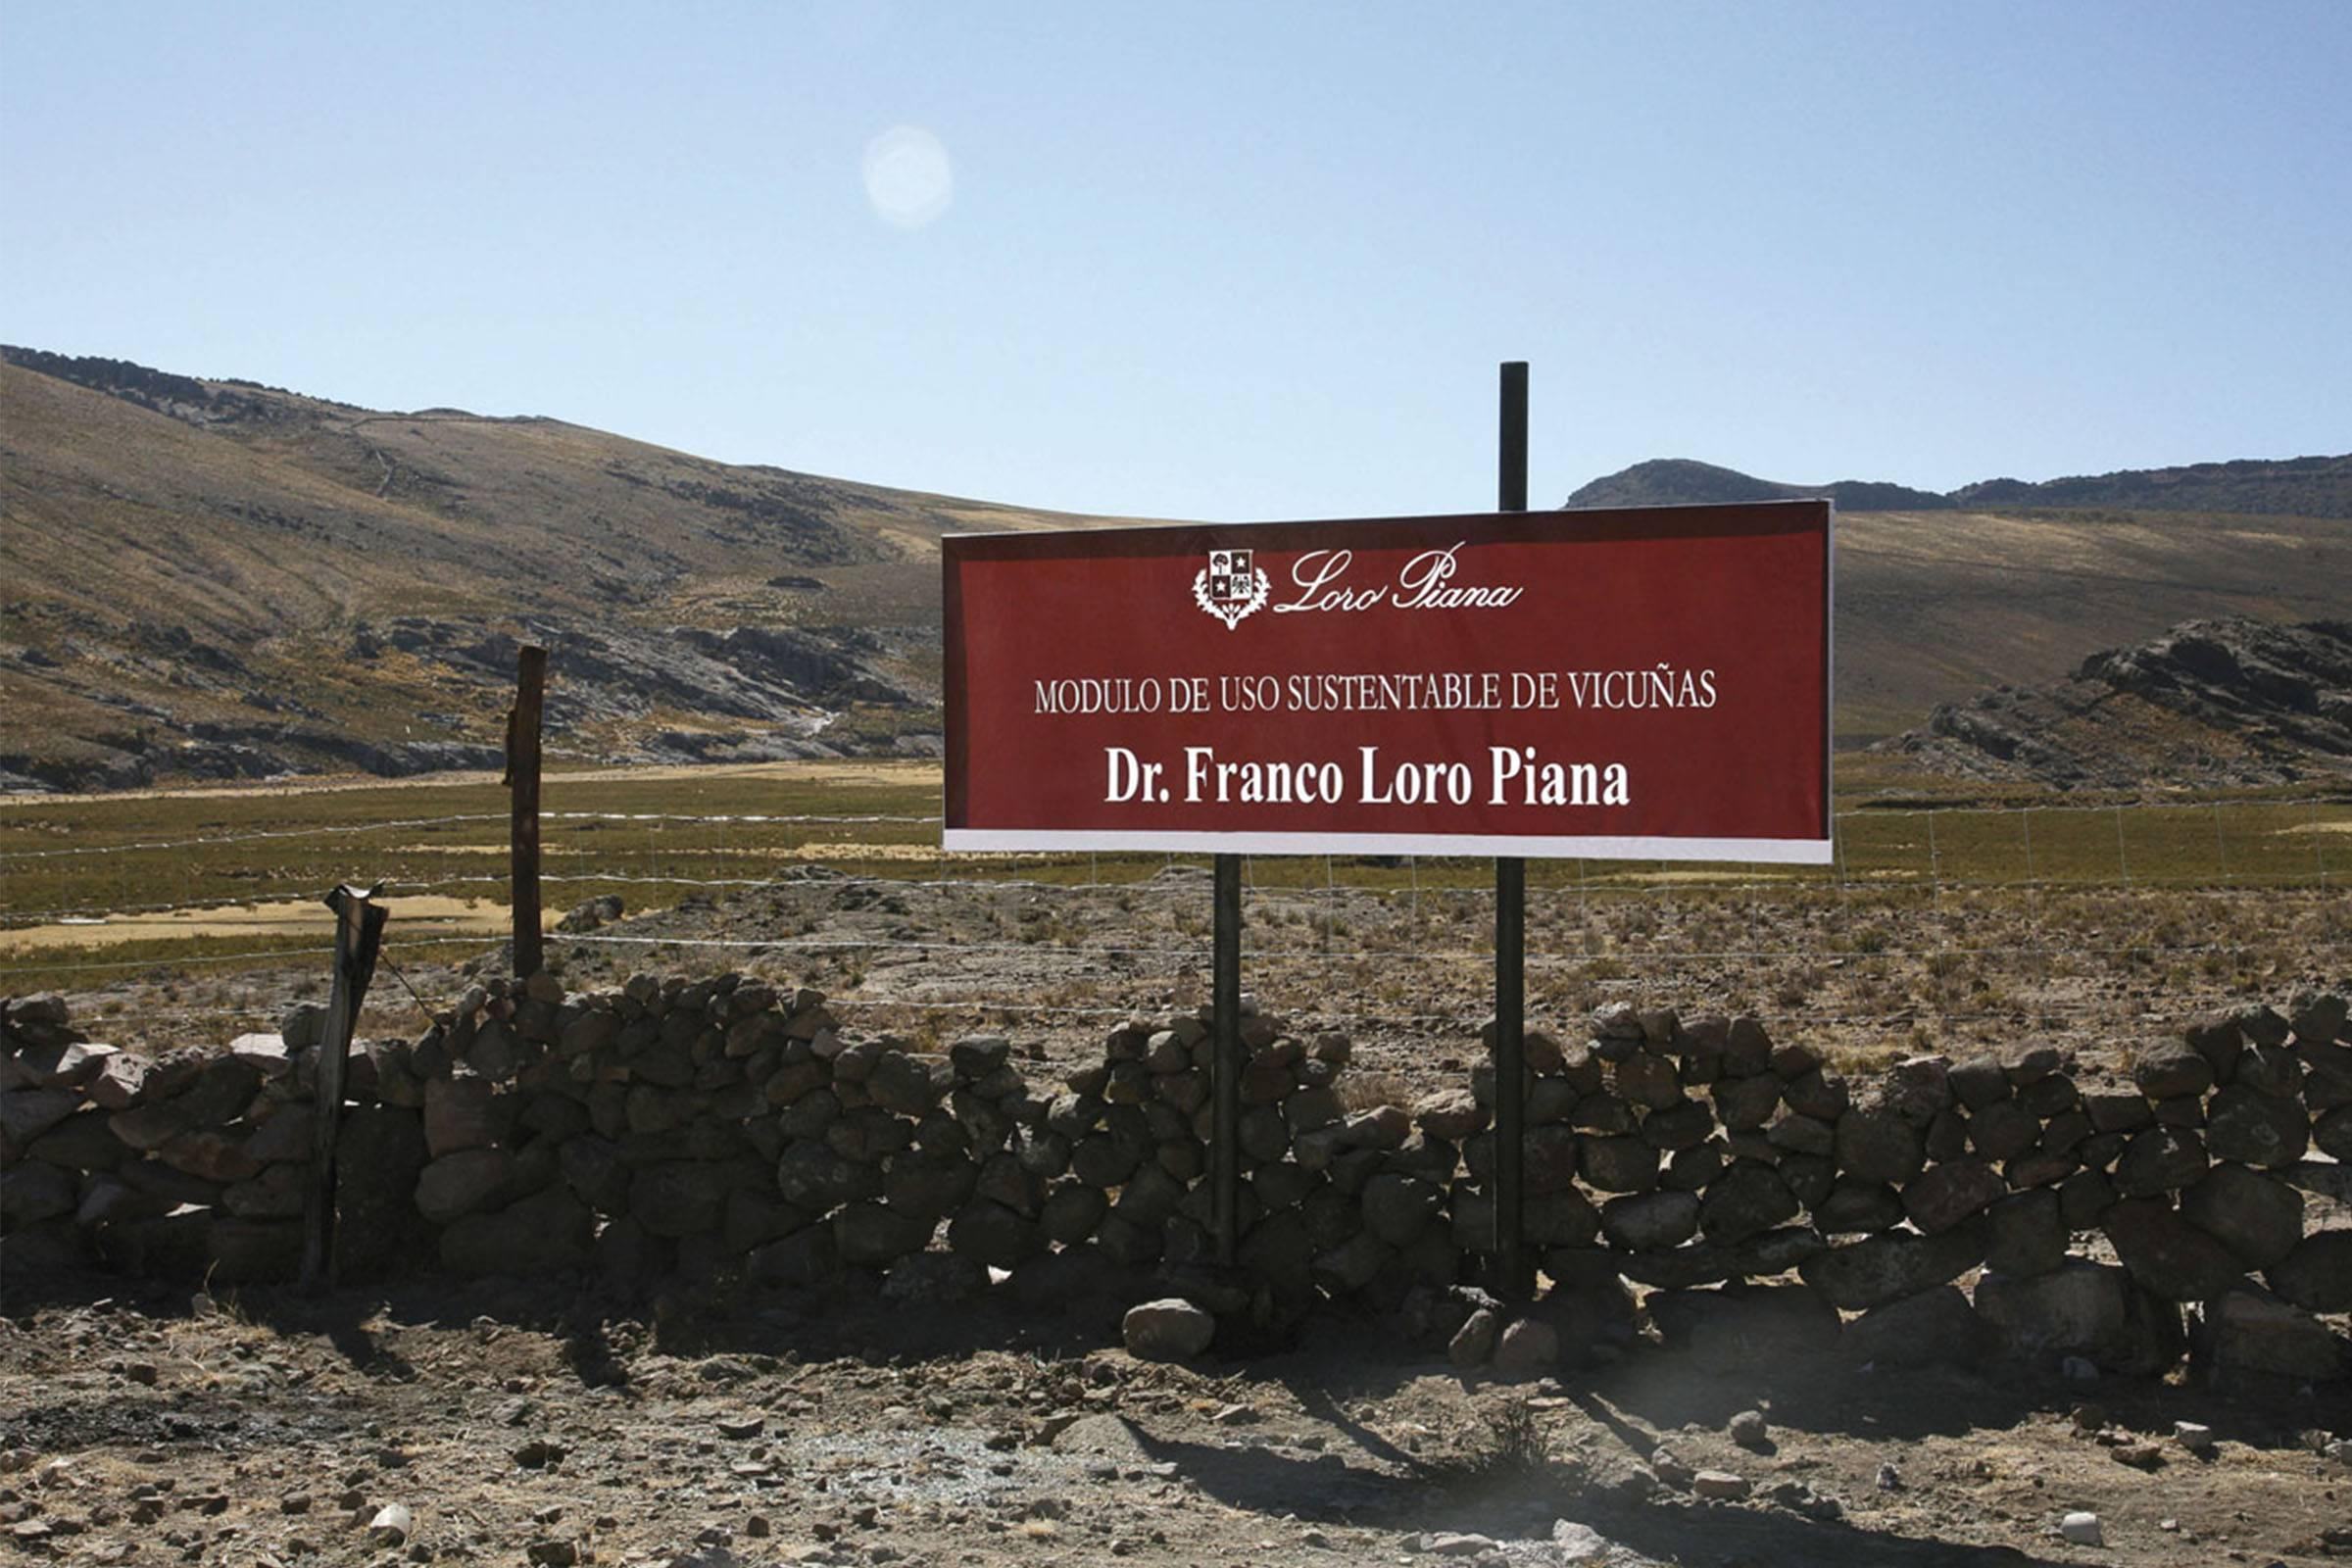 Dr. Franco Loro Piana Reserve in Peru